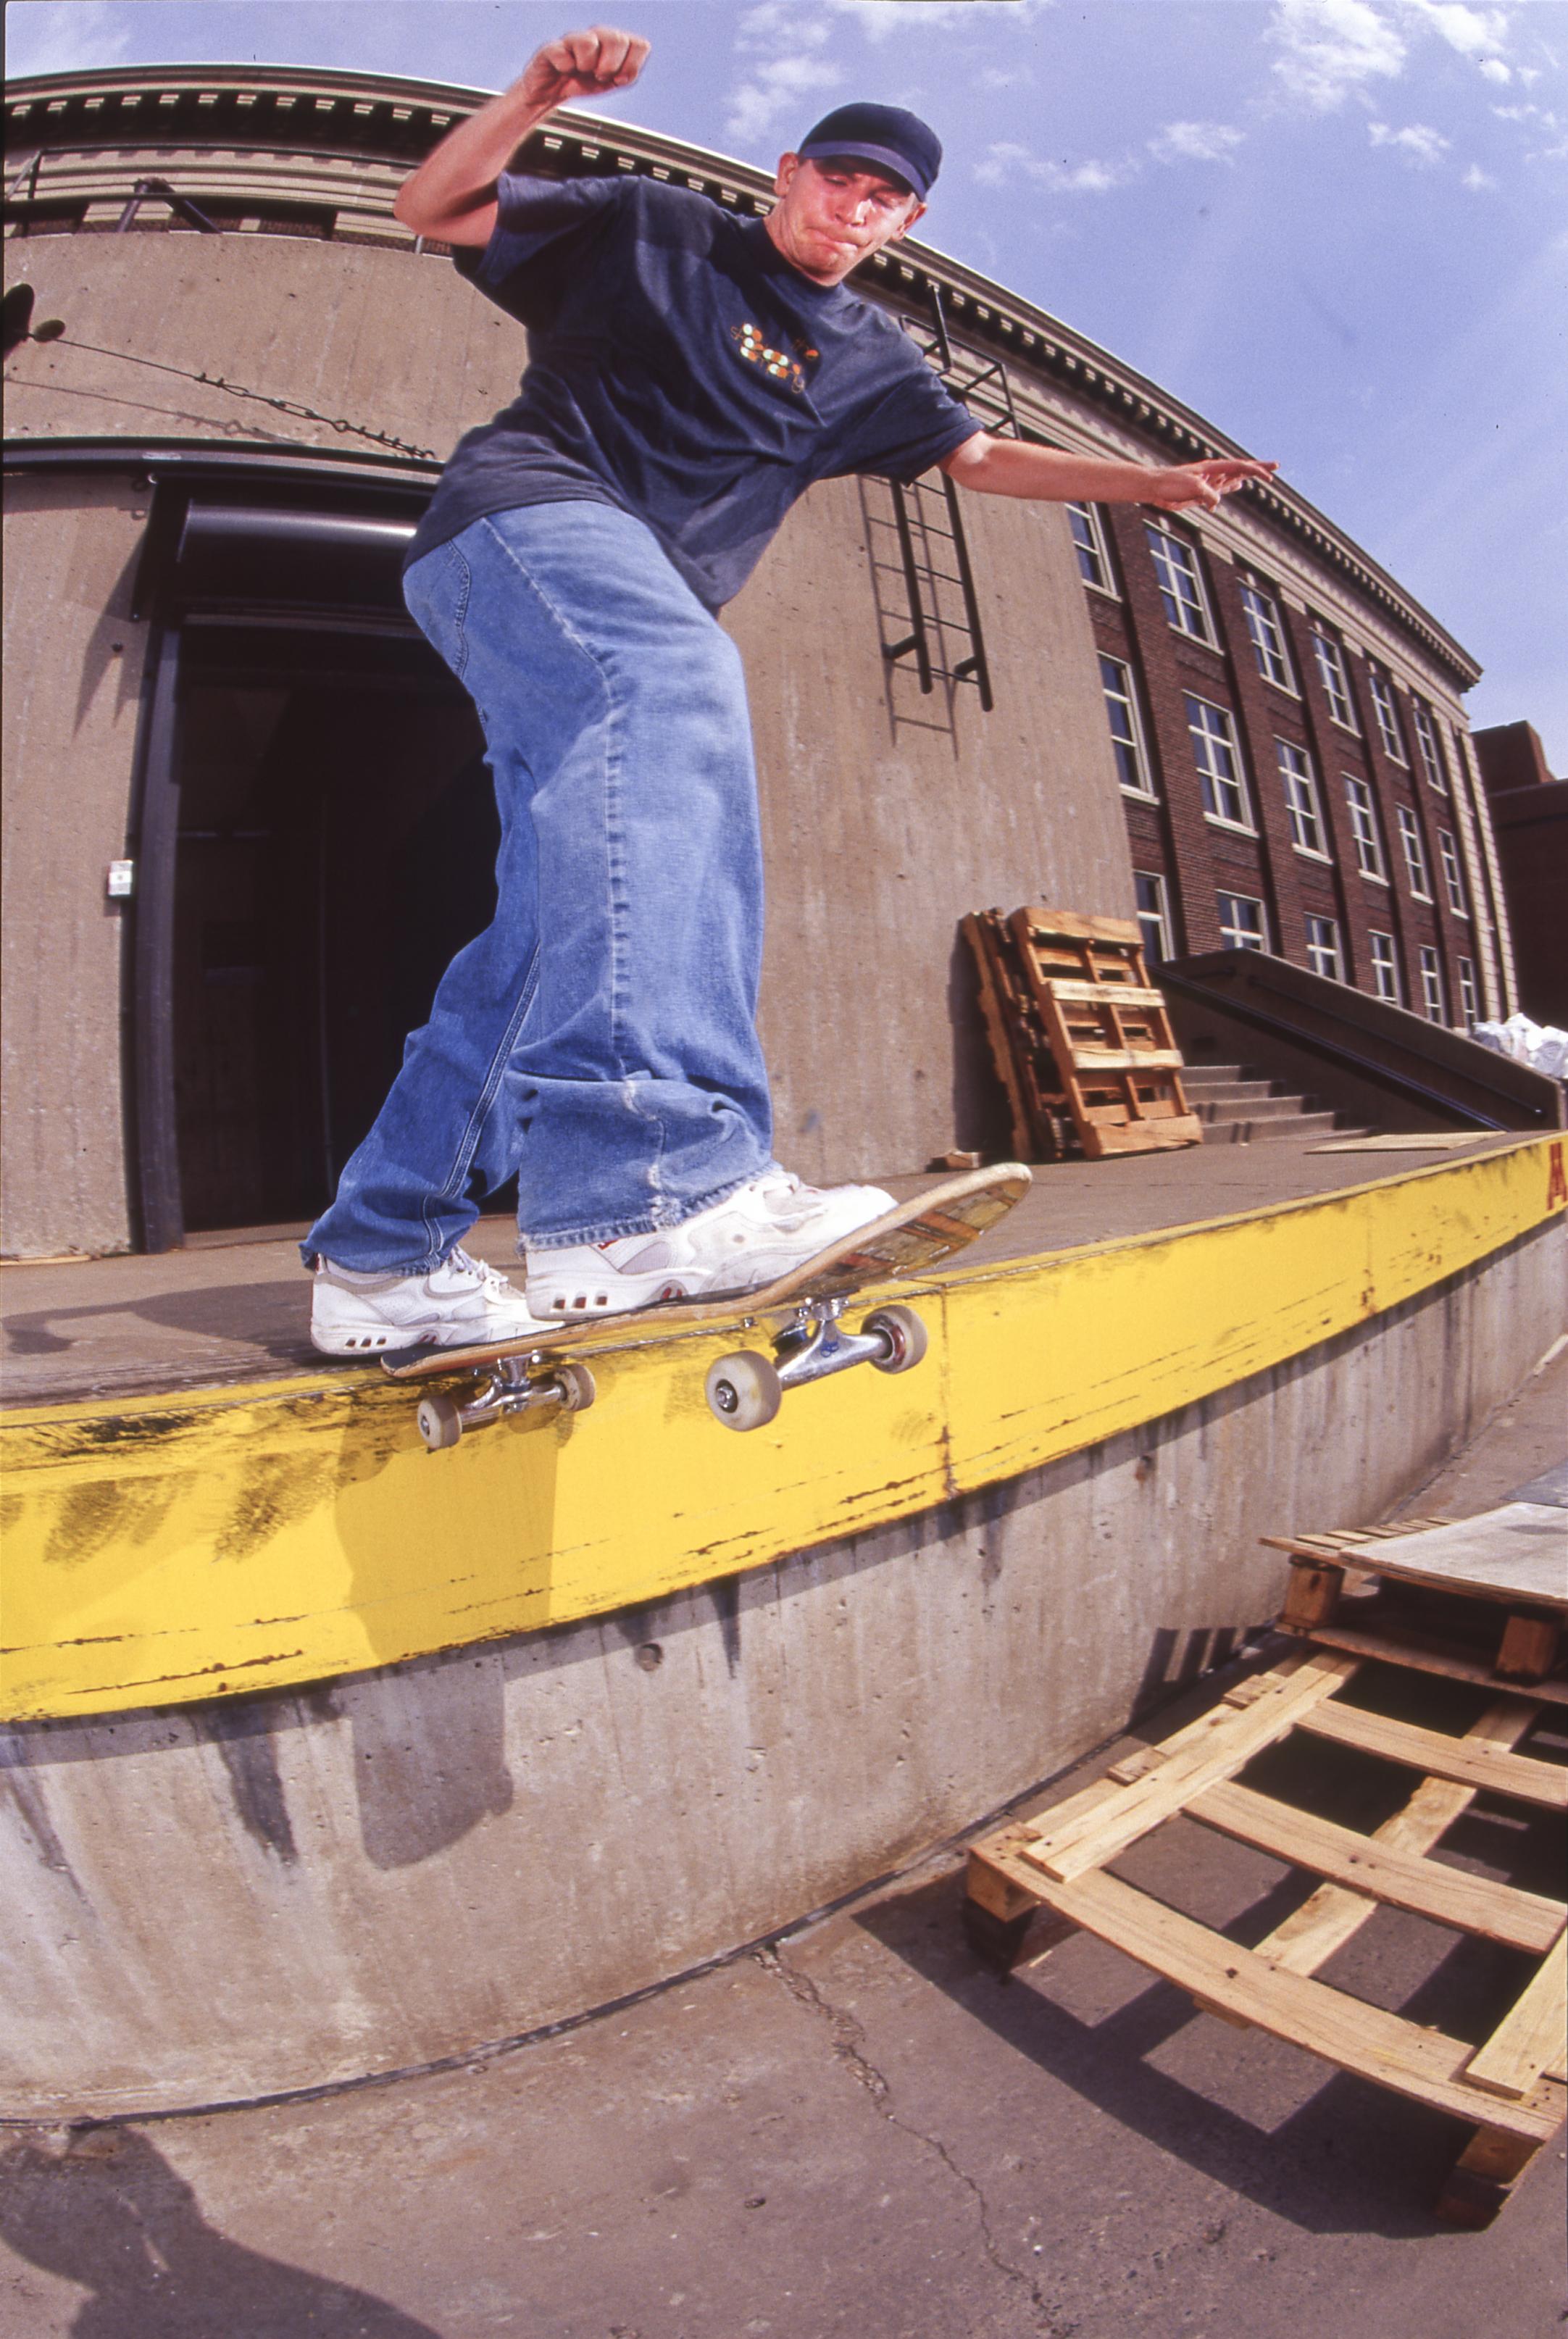 Chad Benson backside tailslide at the University of Minnesota.